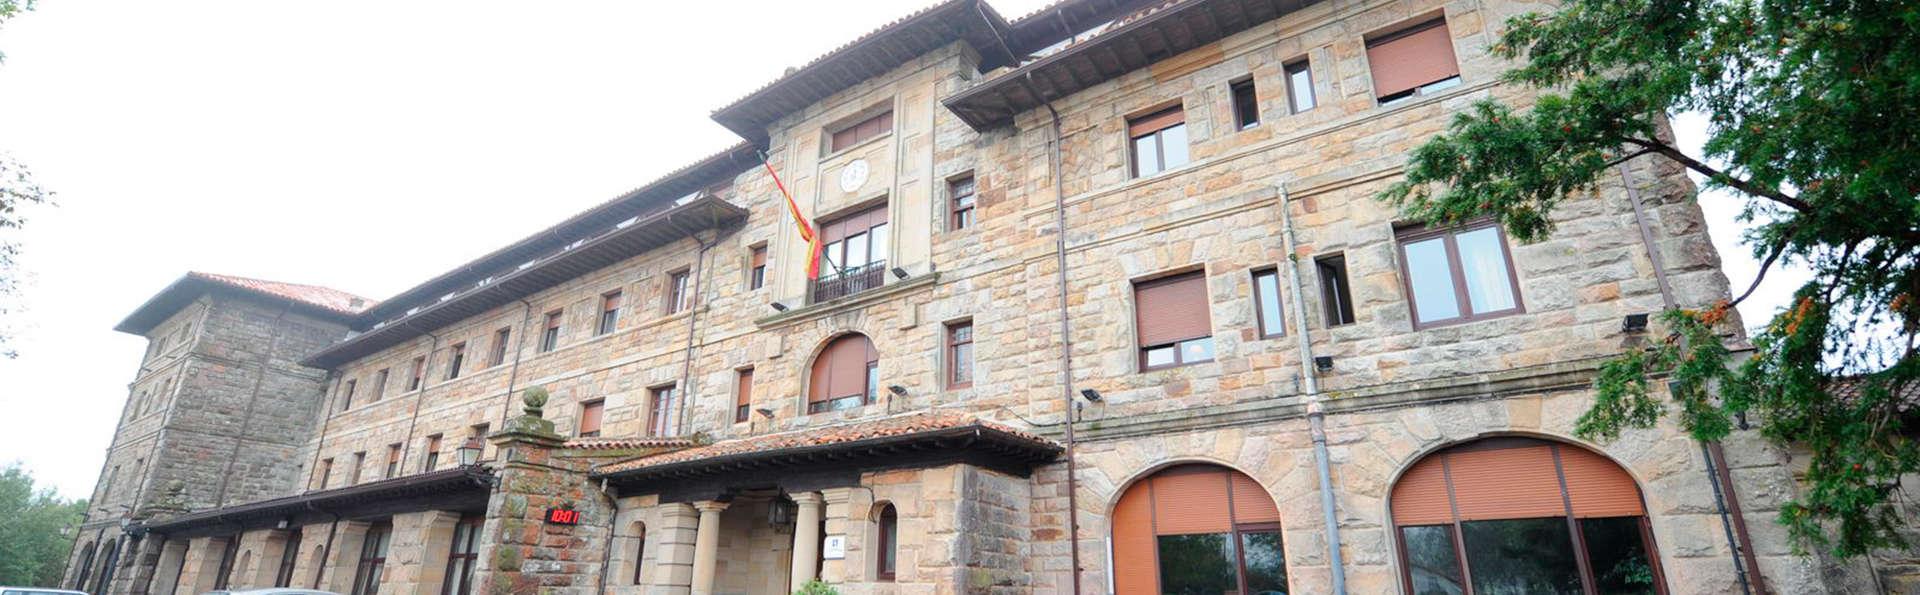 Gran Hotel Balneario de Corconte - EDIT_NEW_front1.jpg